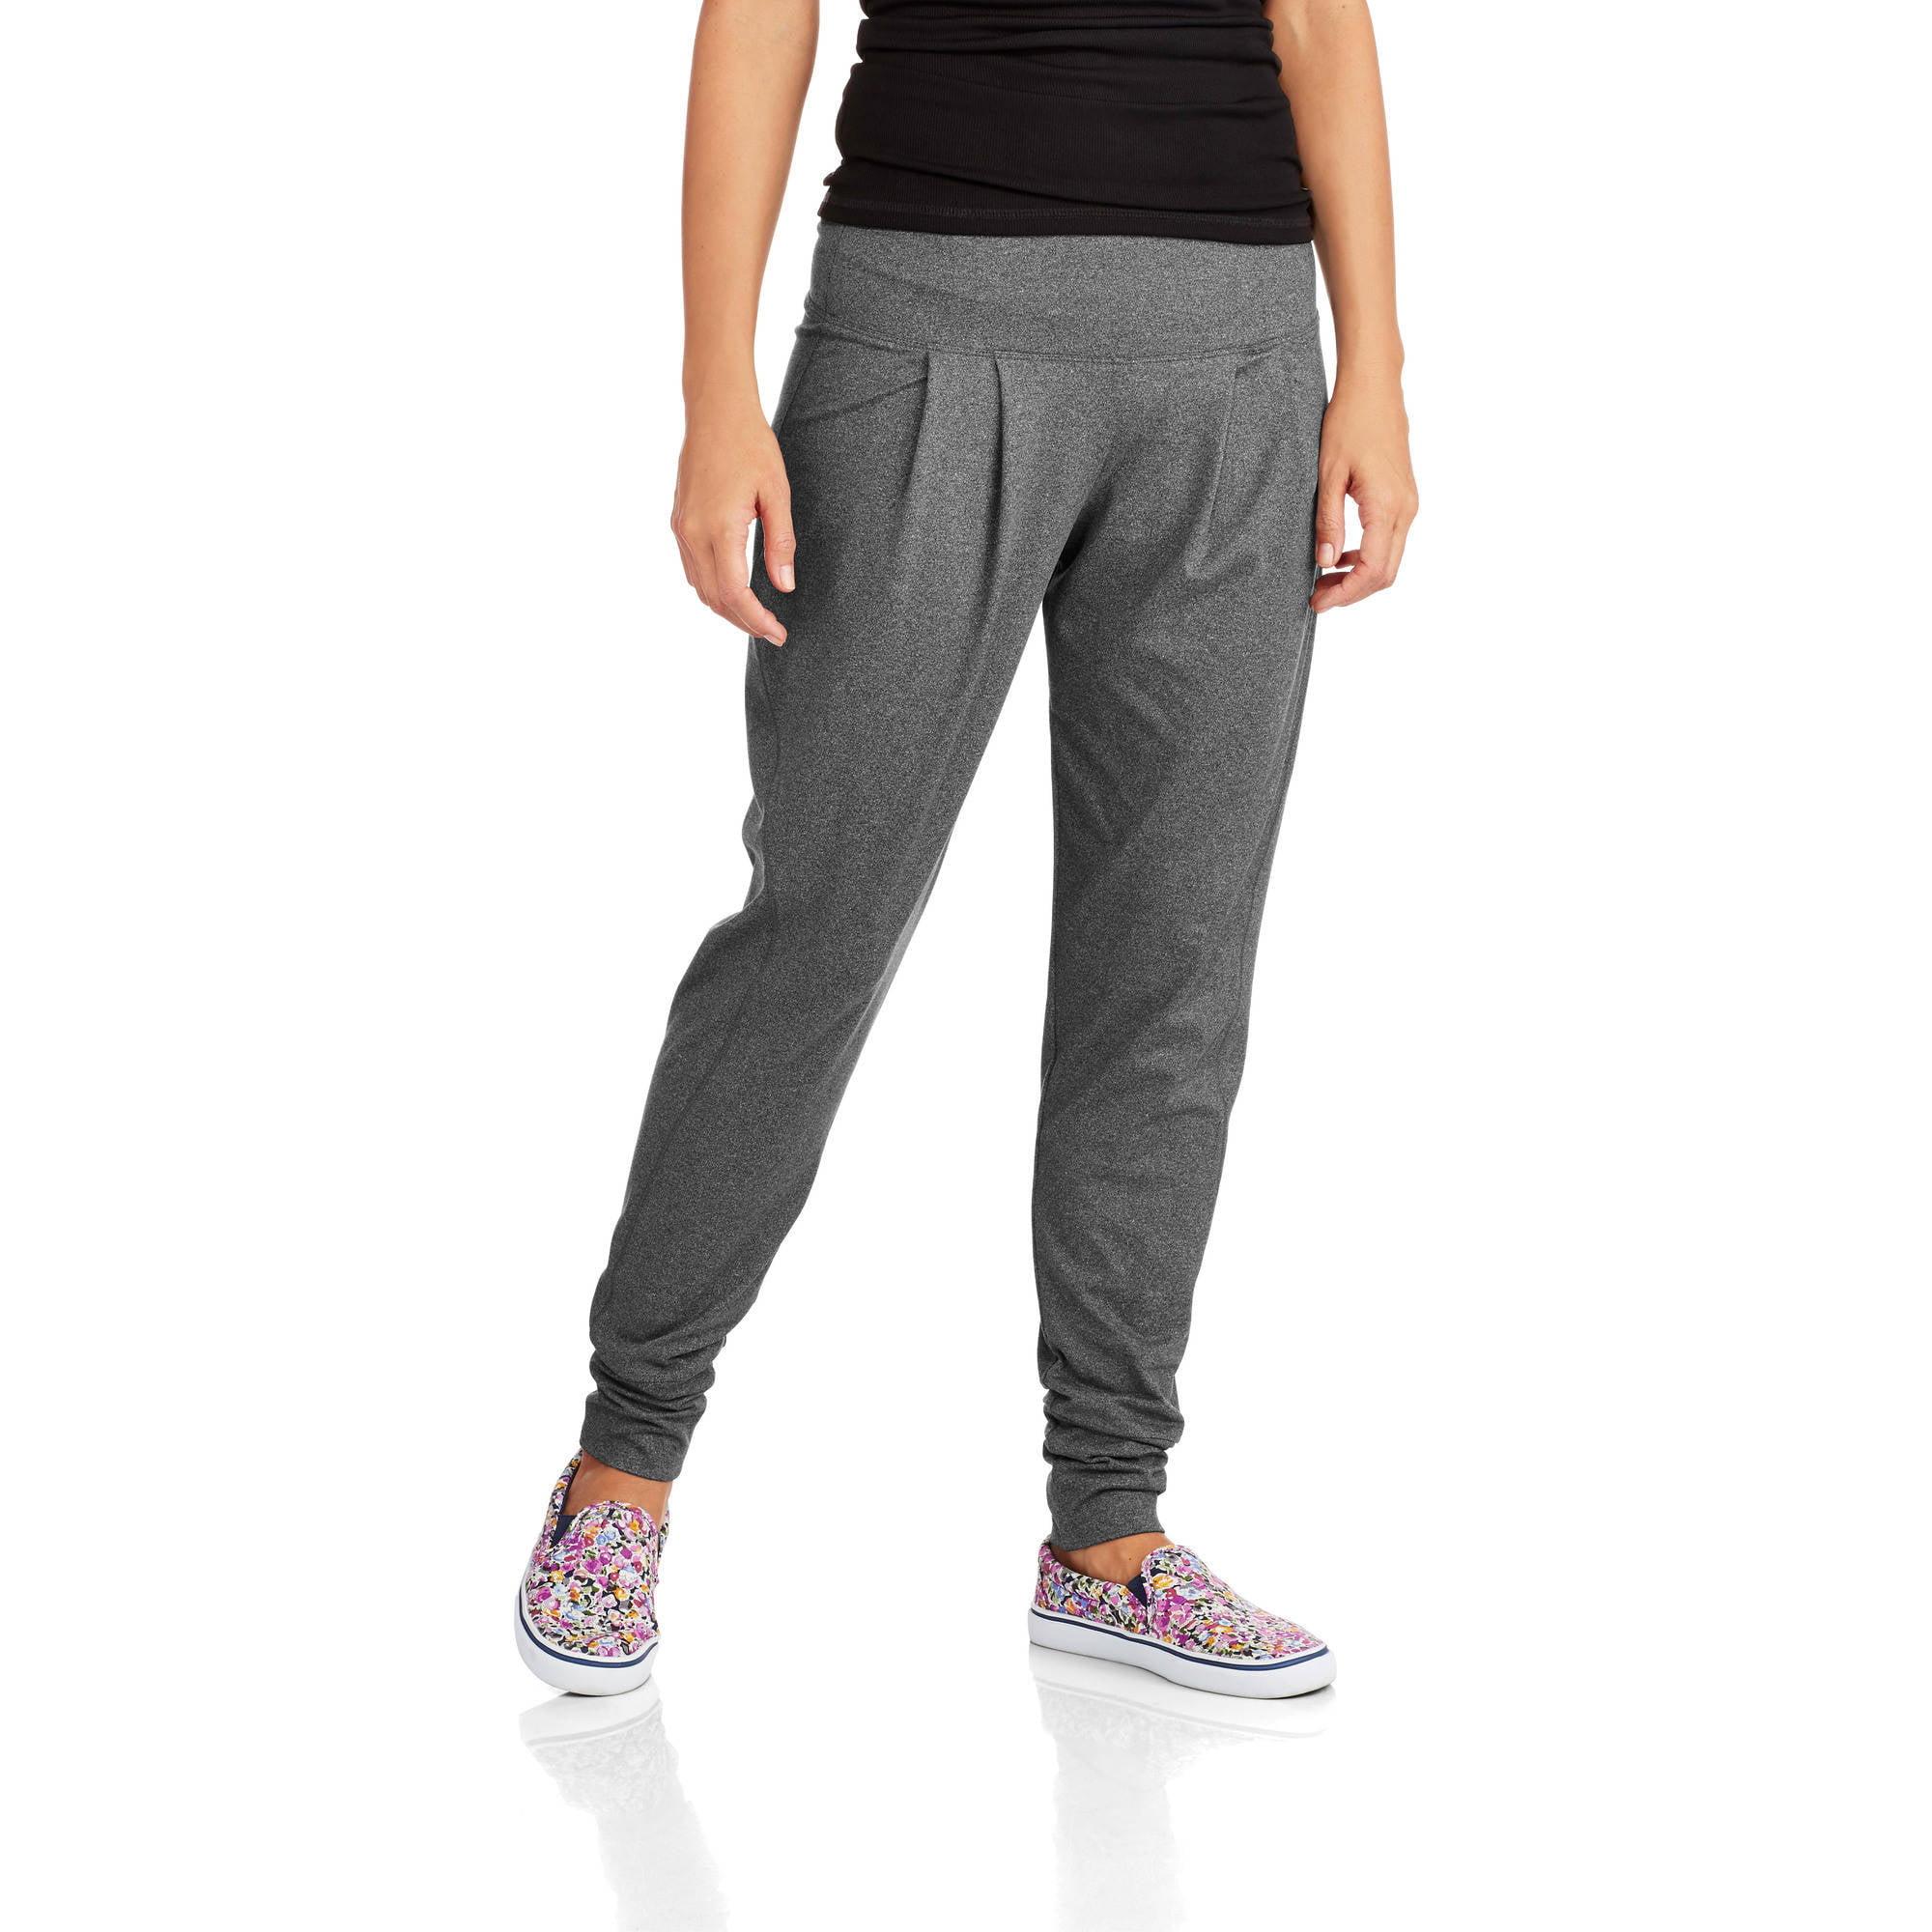 Yoga Pants - Walmart.com